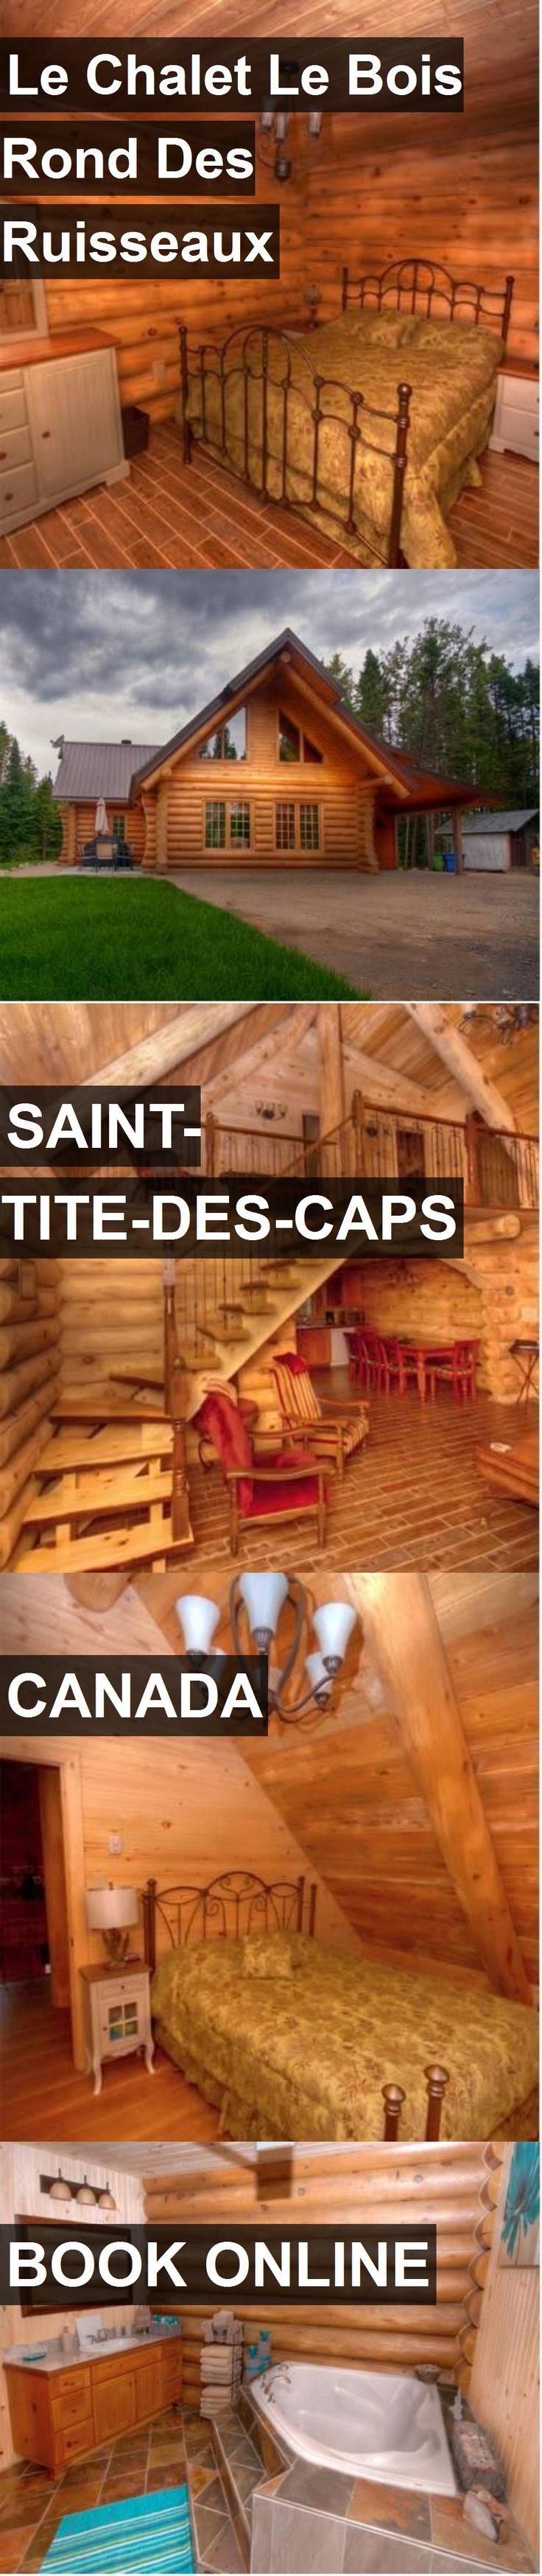 Hotel Le Chalet Le Bois Rond Des Ruisseaux in Saint-Tite-des-Caps, Canada. For more information, photos, reviews and best prices please follow the link. #Canada #Saint-Tite-des-Caps #hotel #travel #vacation